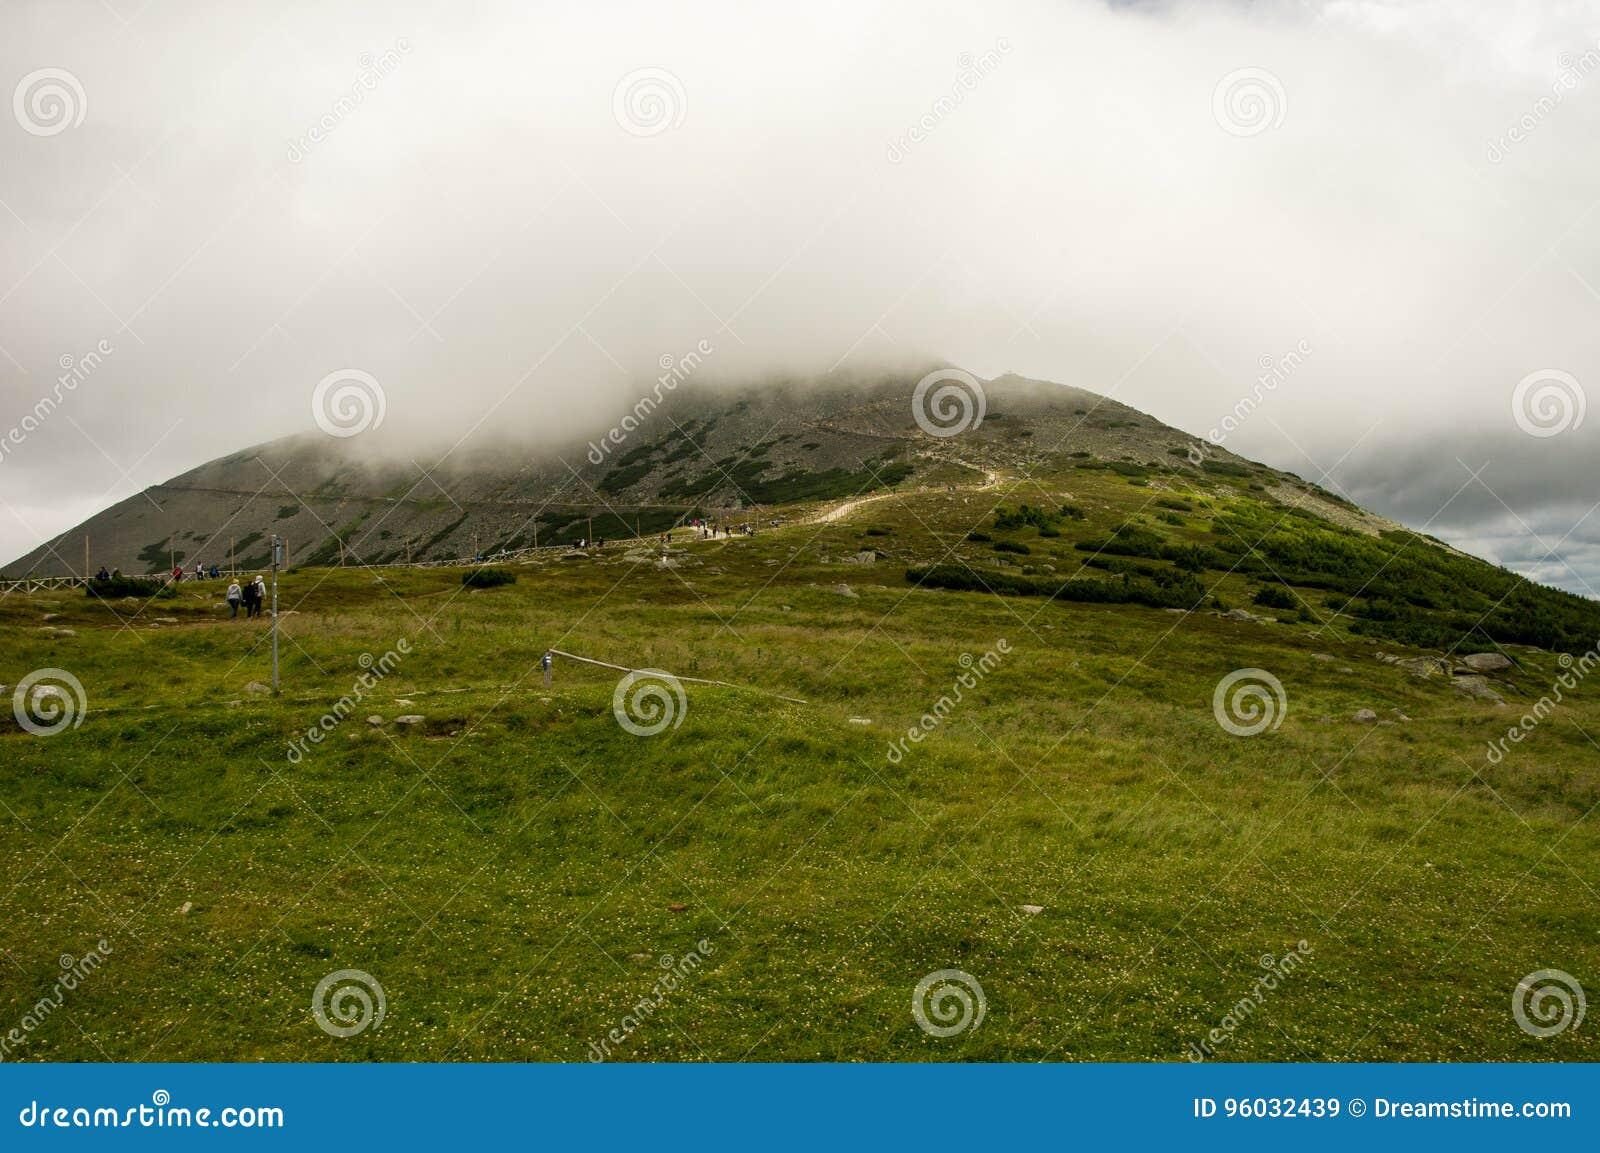 Widok na sposobie ÅšnieÅ ¼ ka, Gigantyczne góry, Polska